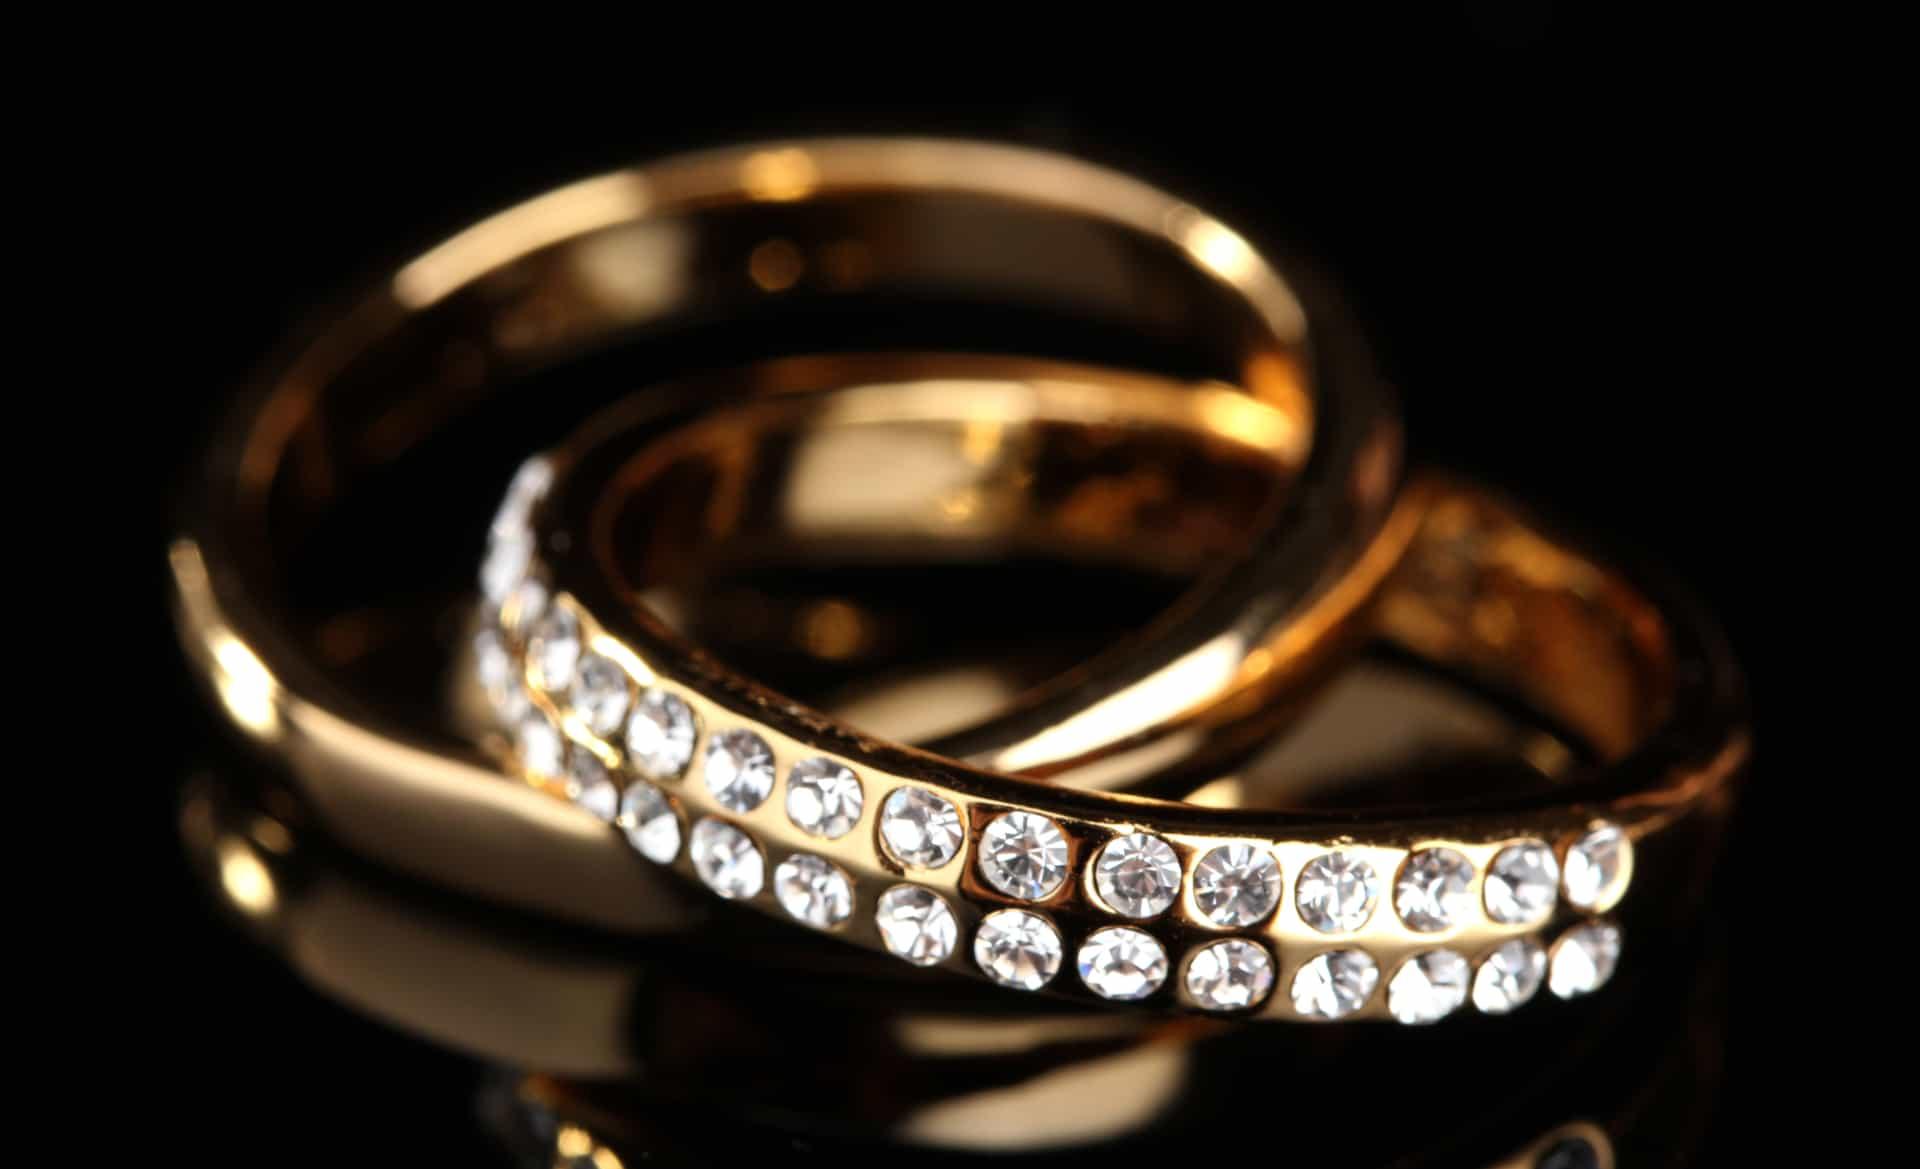 Example of jewelry photo description